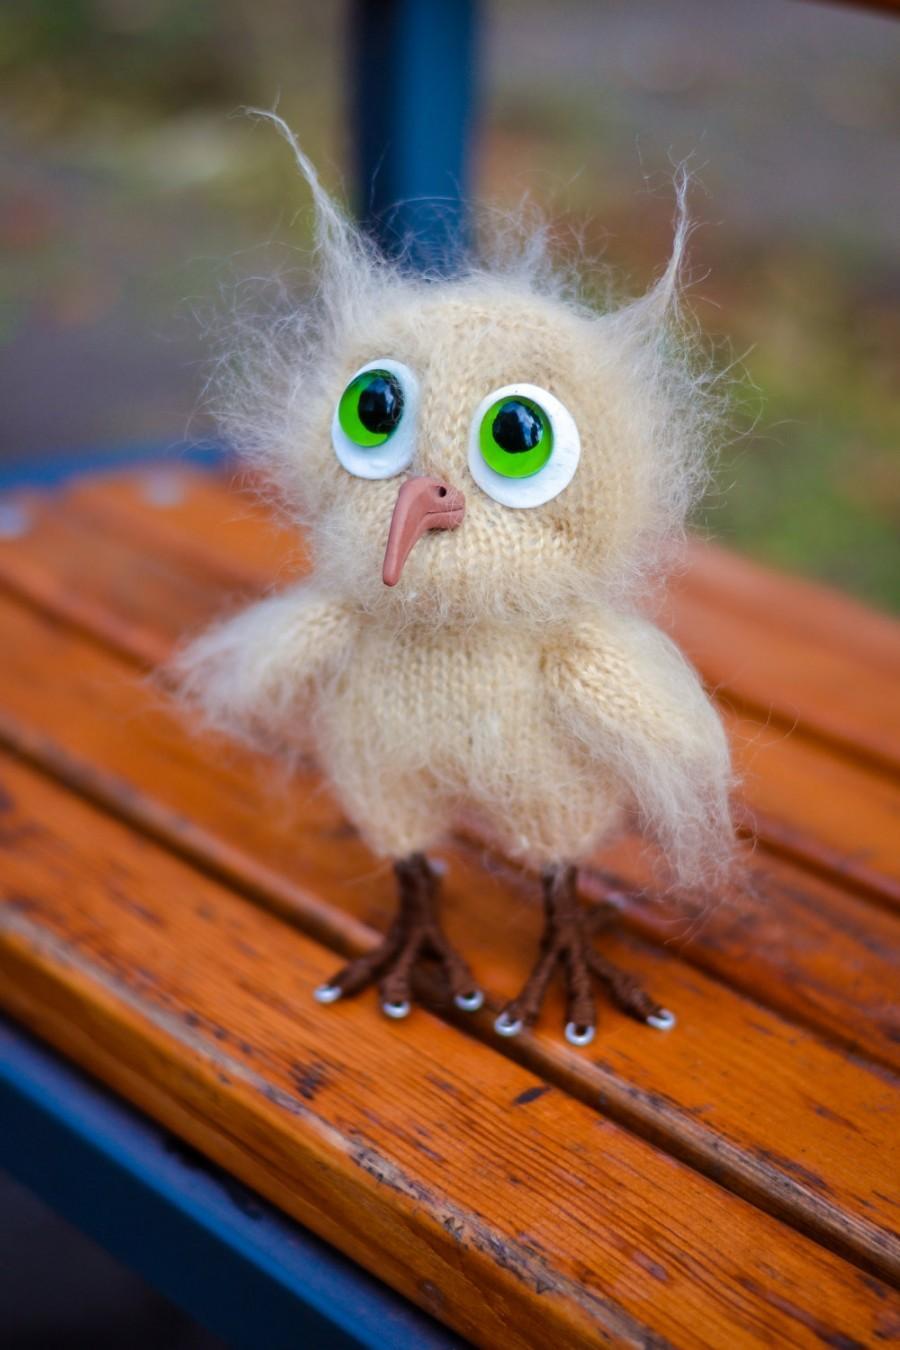 Stuffed Owl Toy Stuffed Owl Plush Owl Toy Animal Plush Toy Kawaii ...